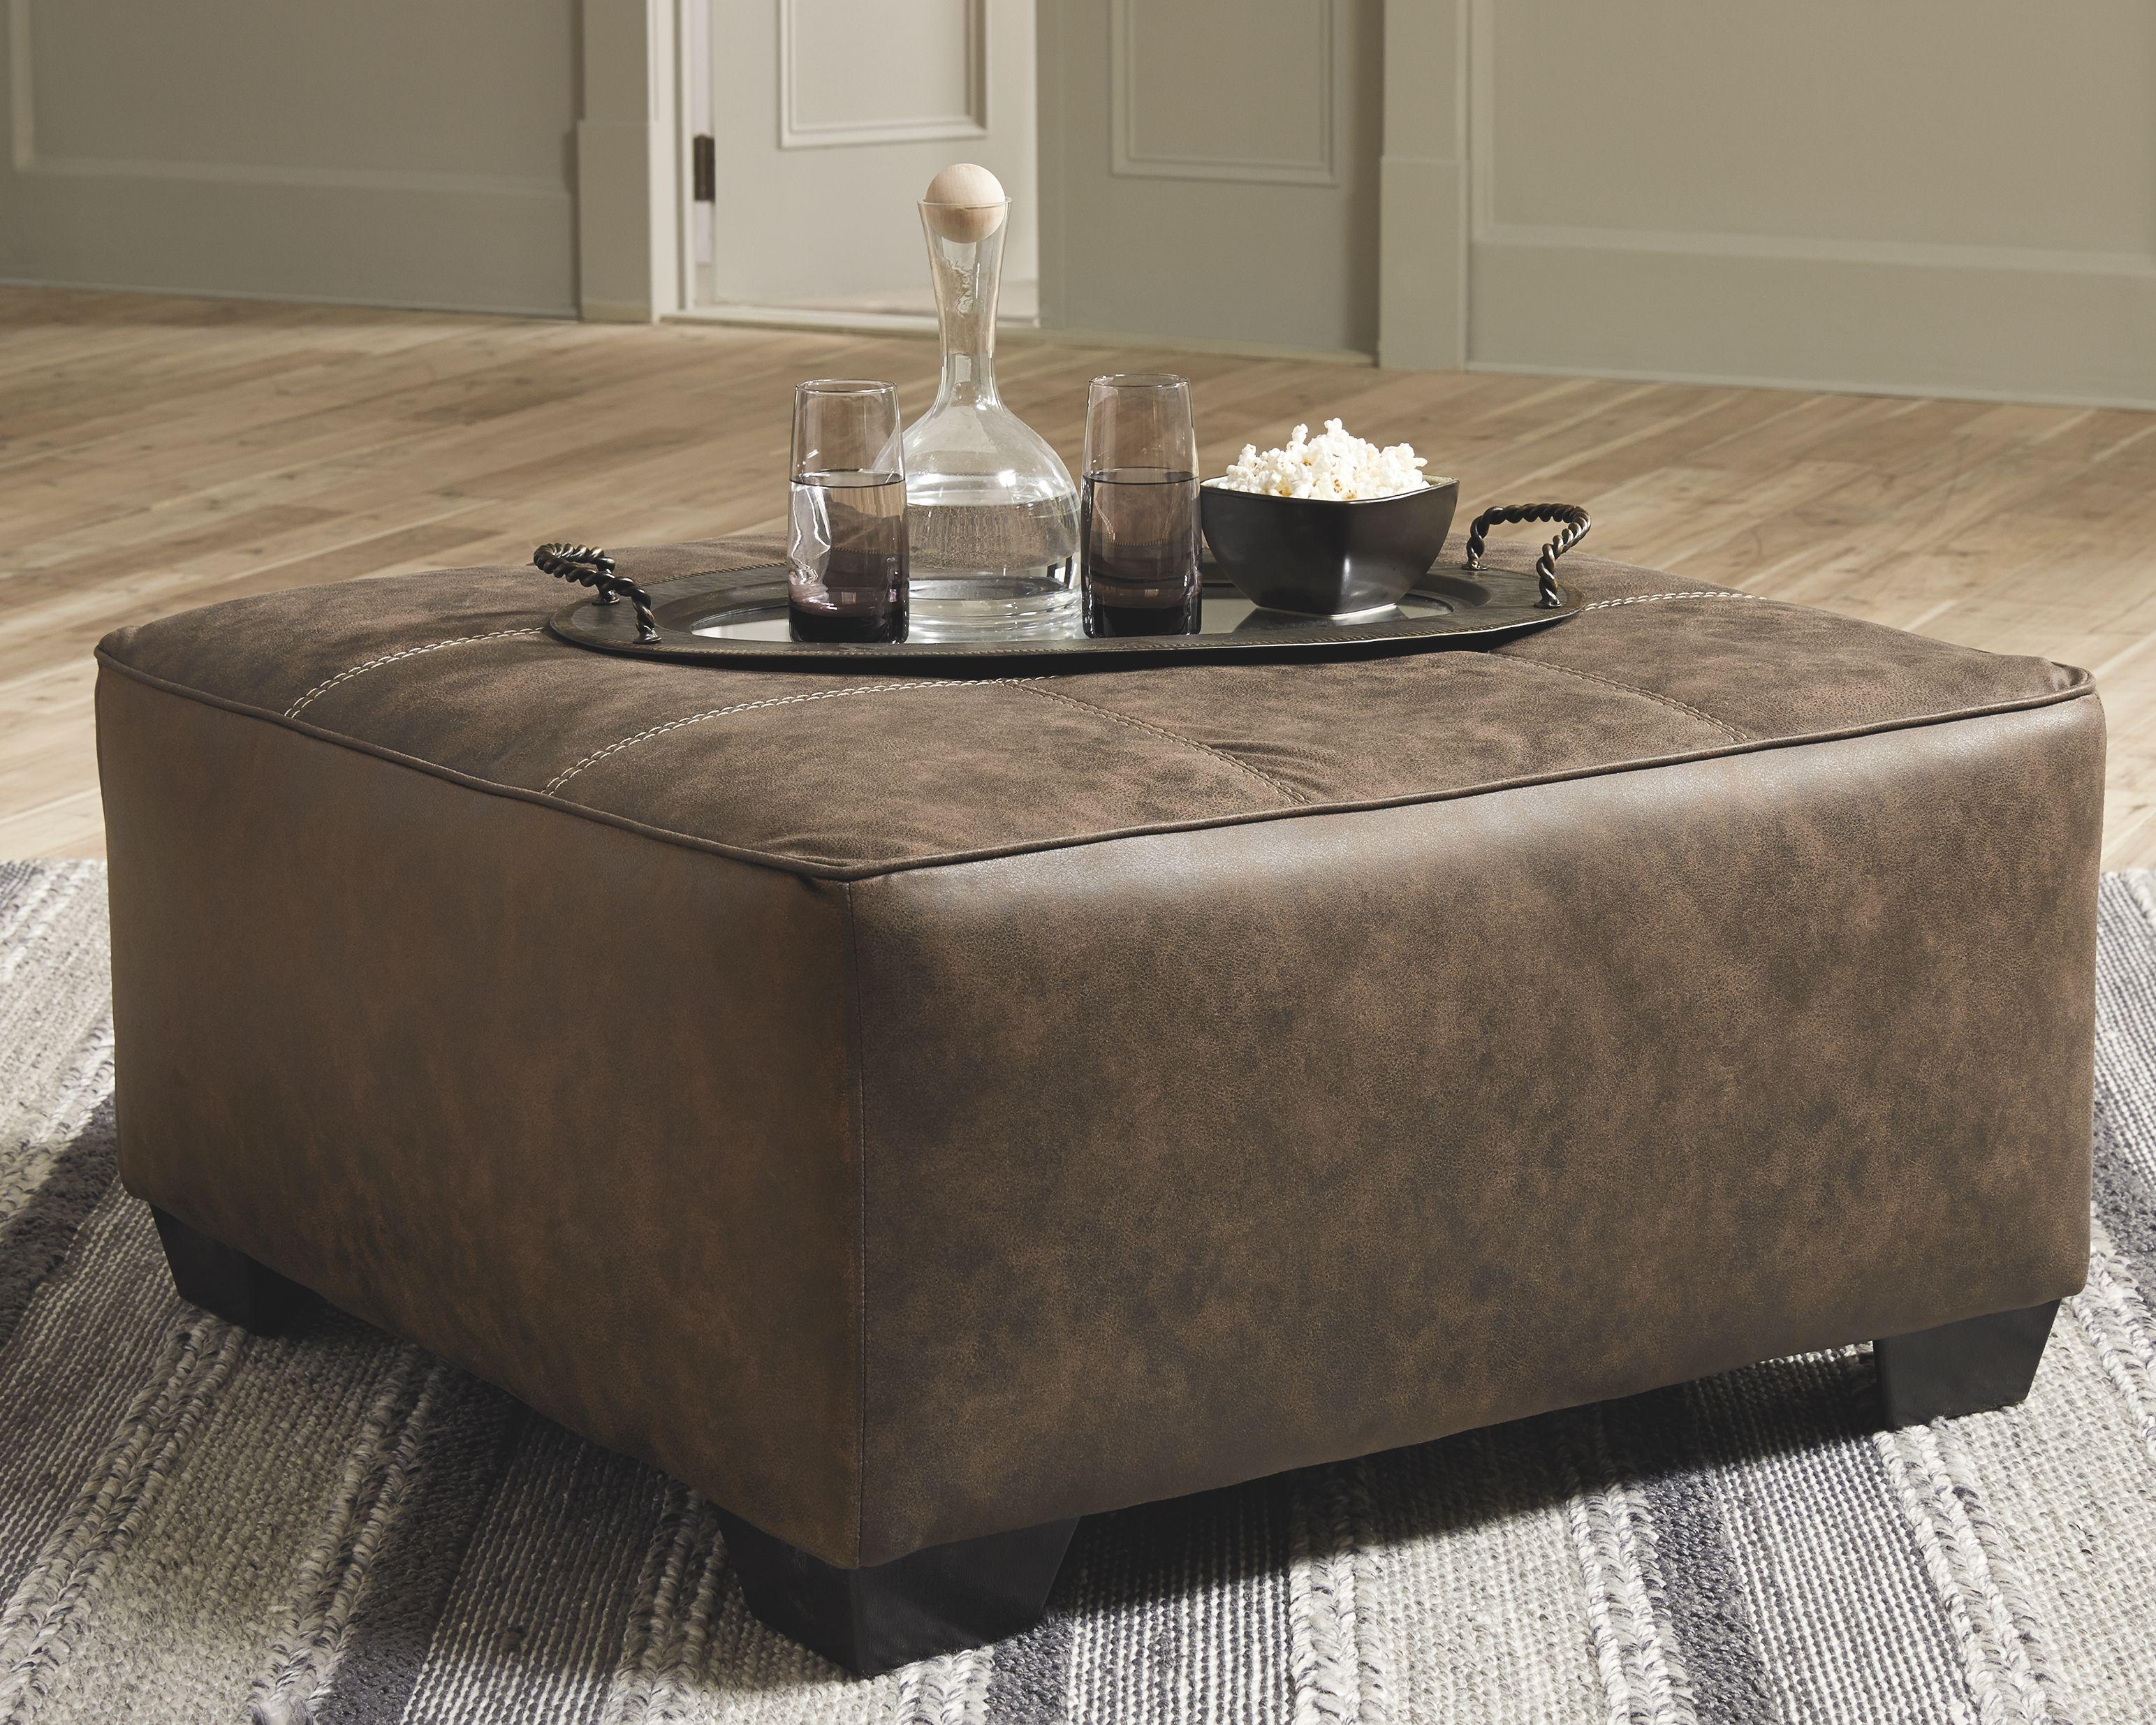 Abalone Oversized Accent Ottoman Ashley Furniture Homestore Leather Ottoman Coffee Table Accent Ottoman Ottoman [ 2470 x 3087 Pixel ]